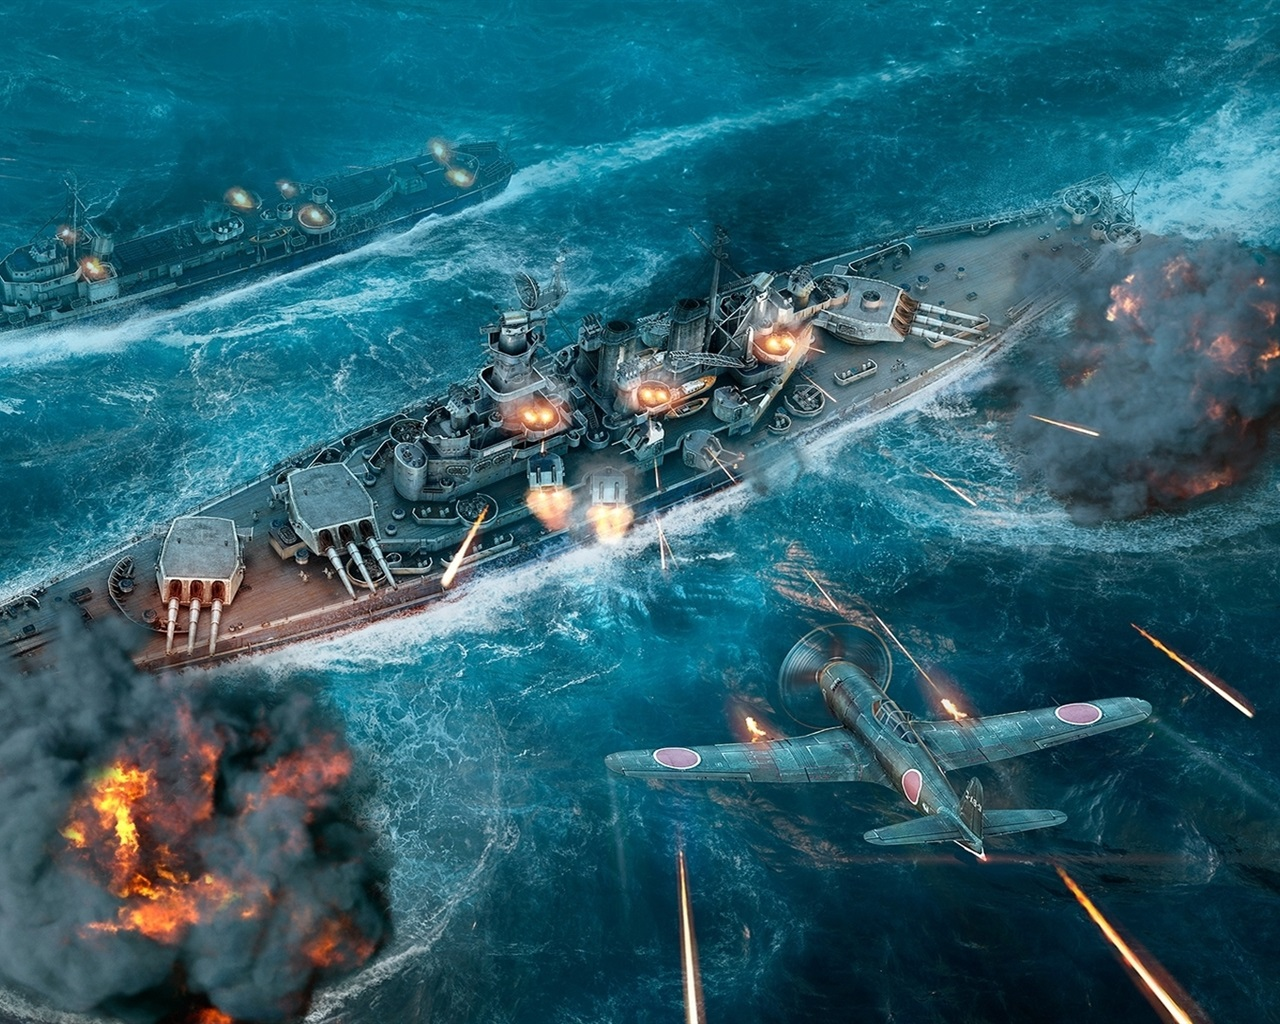 Wallpaper World Of Warships Ships Fighter 1920x1080 Full Hd 2k